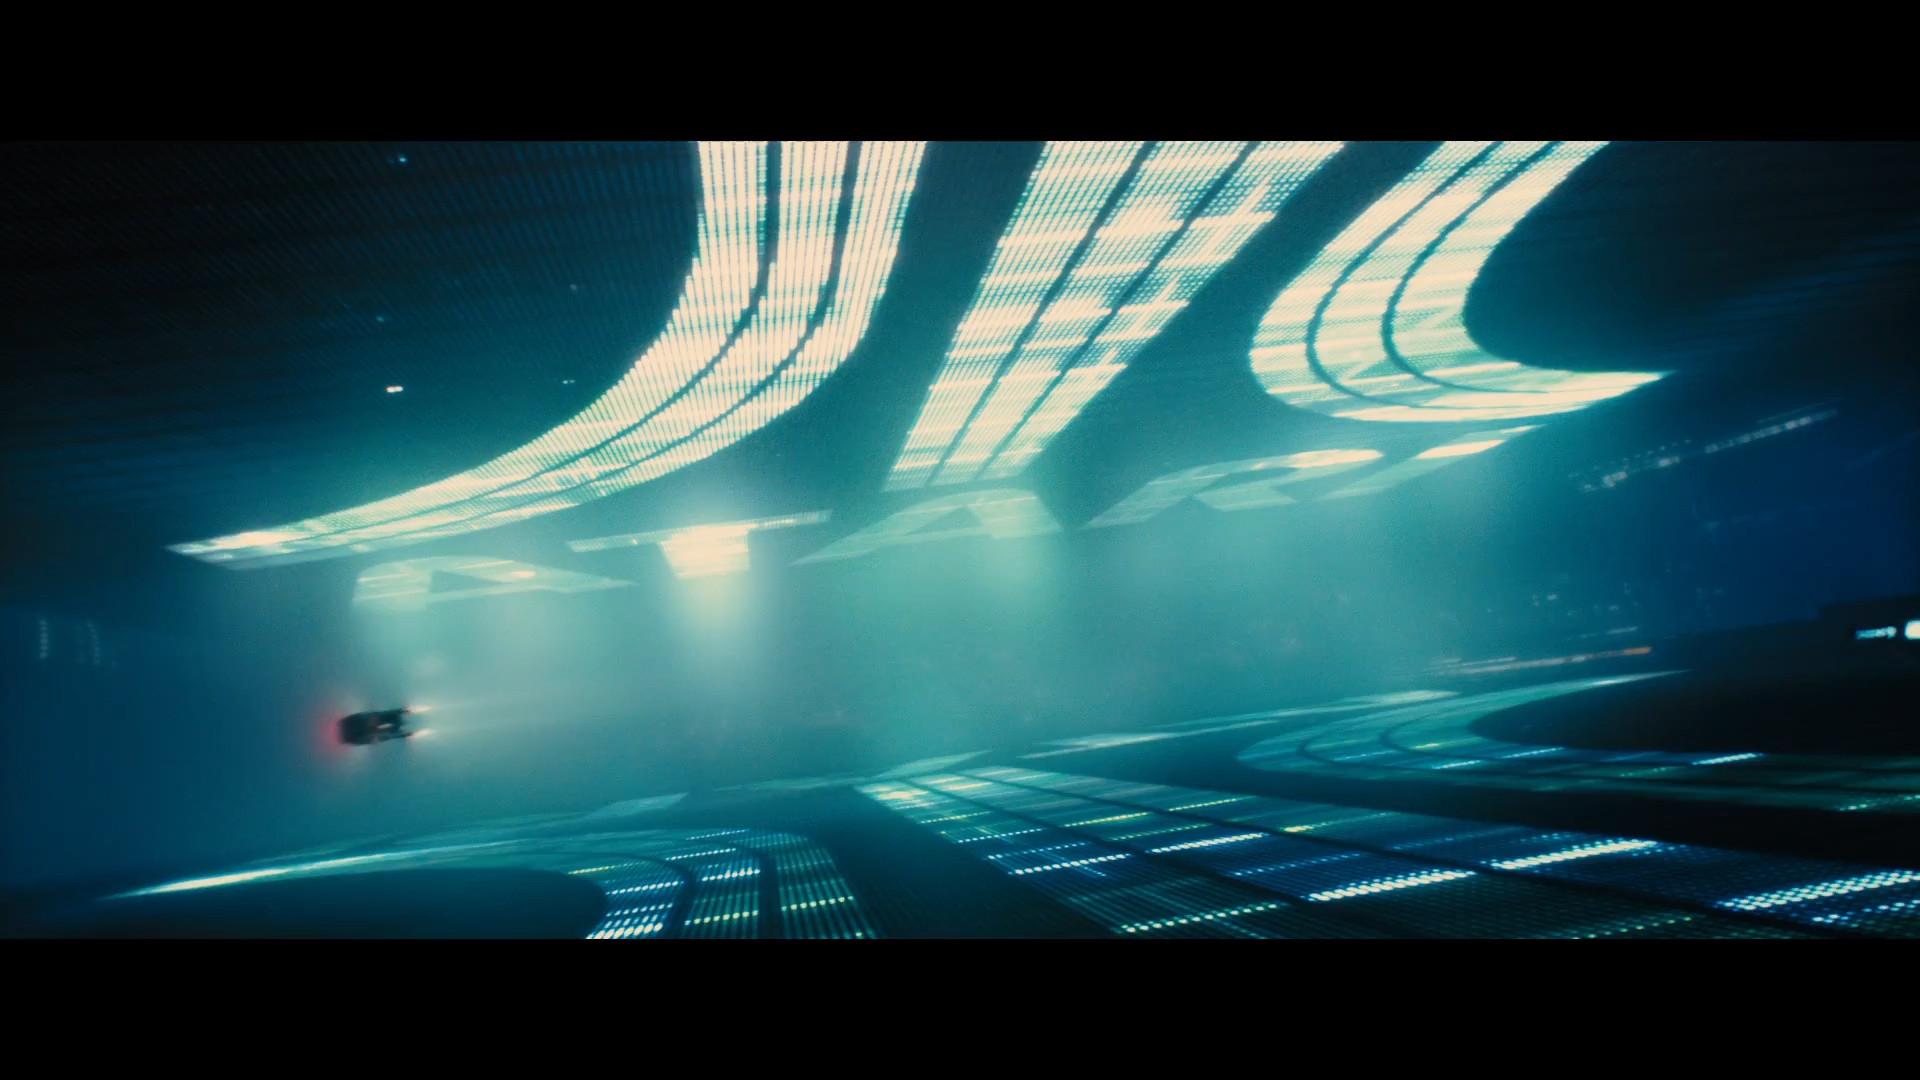 Blade Runner 2049 Wallpapers From Trailer 1920x1080